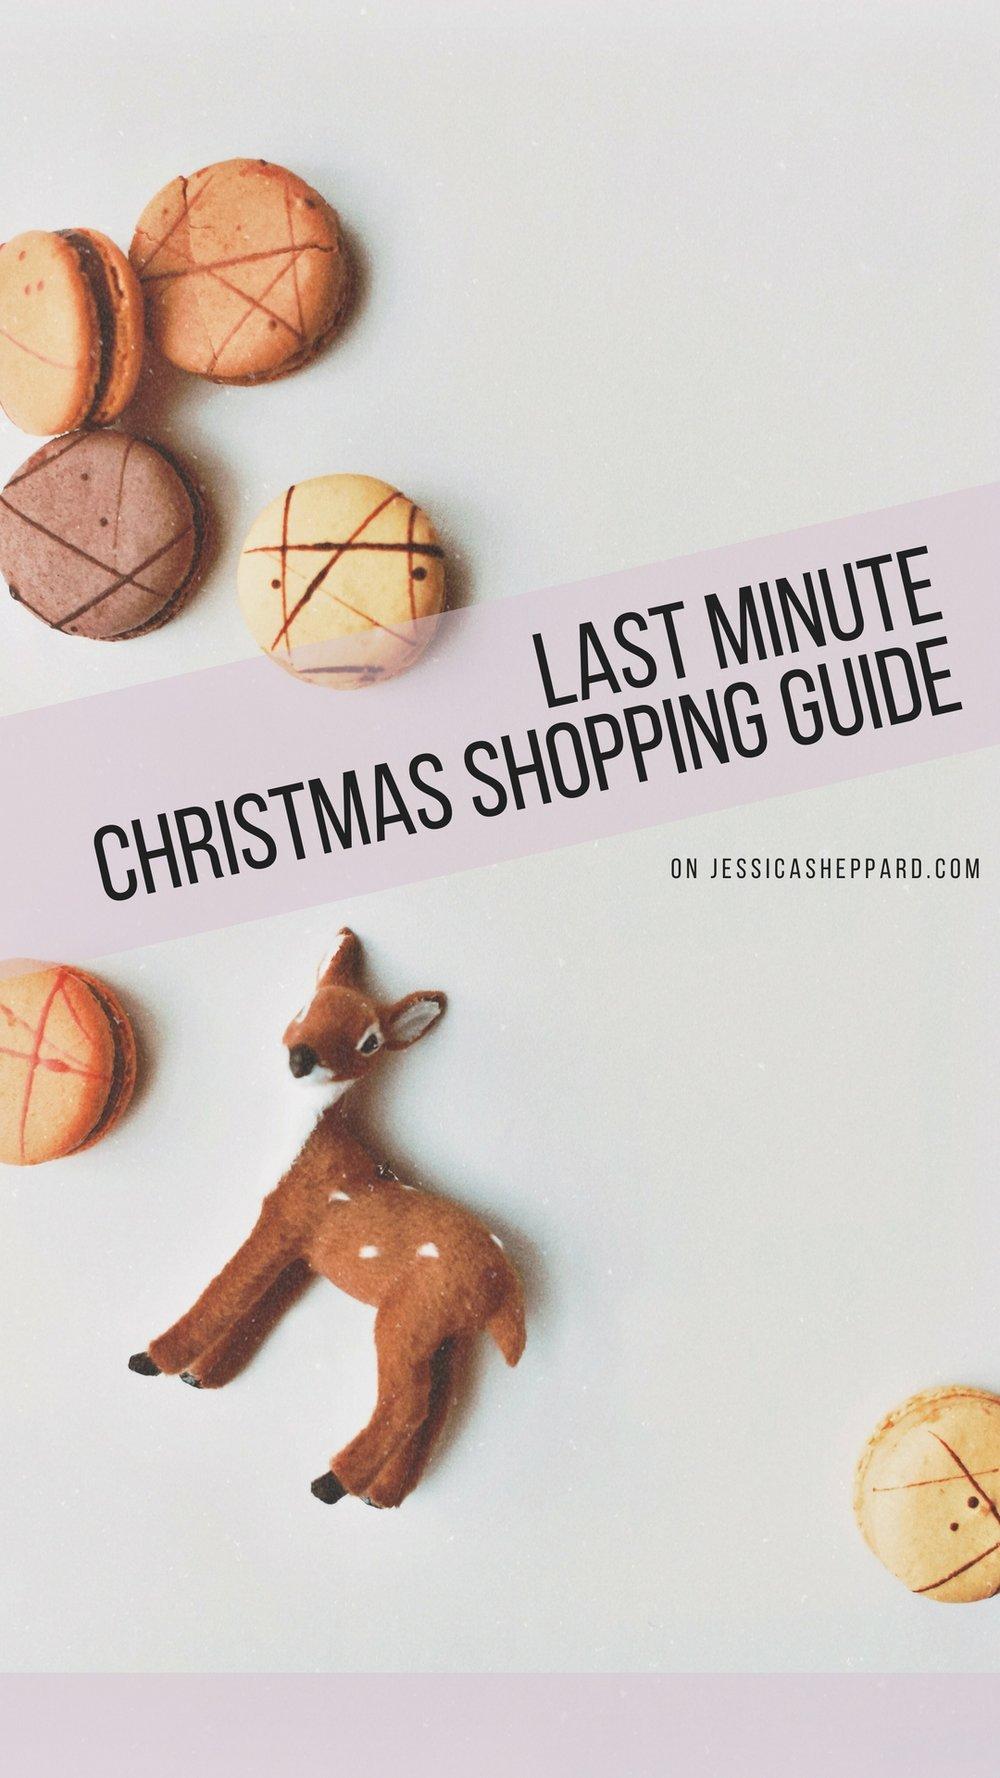 Last-Minute-Christmas-Shopping_jessicasheppard.com.jpg